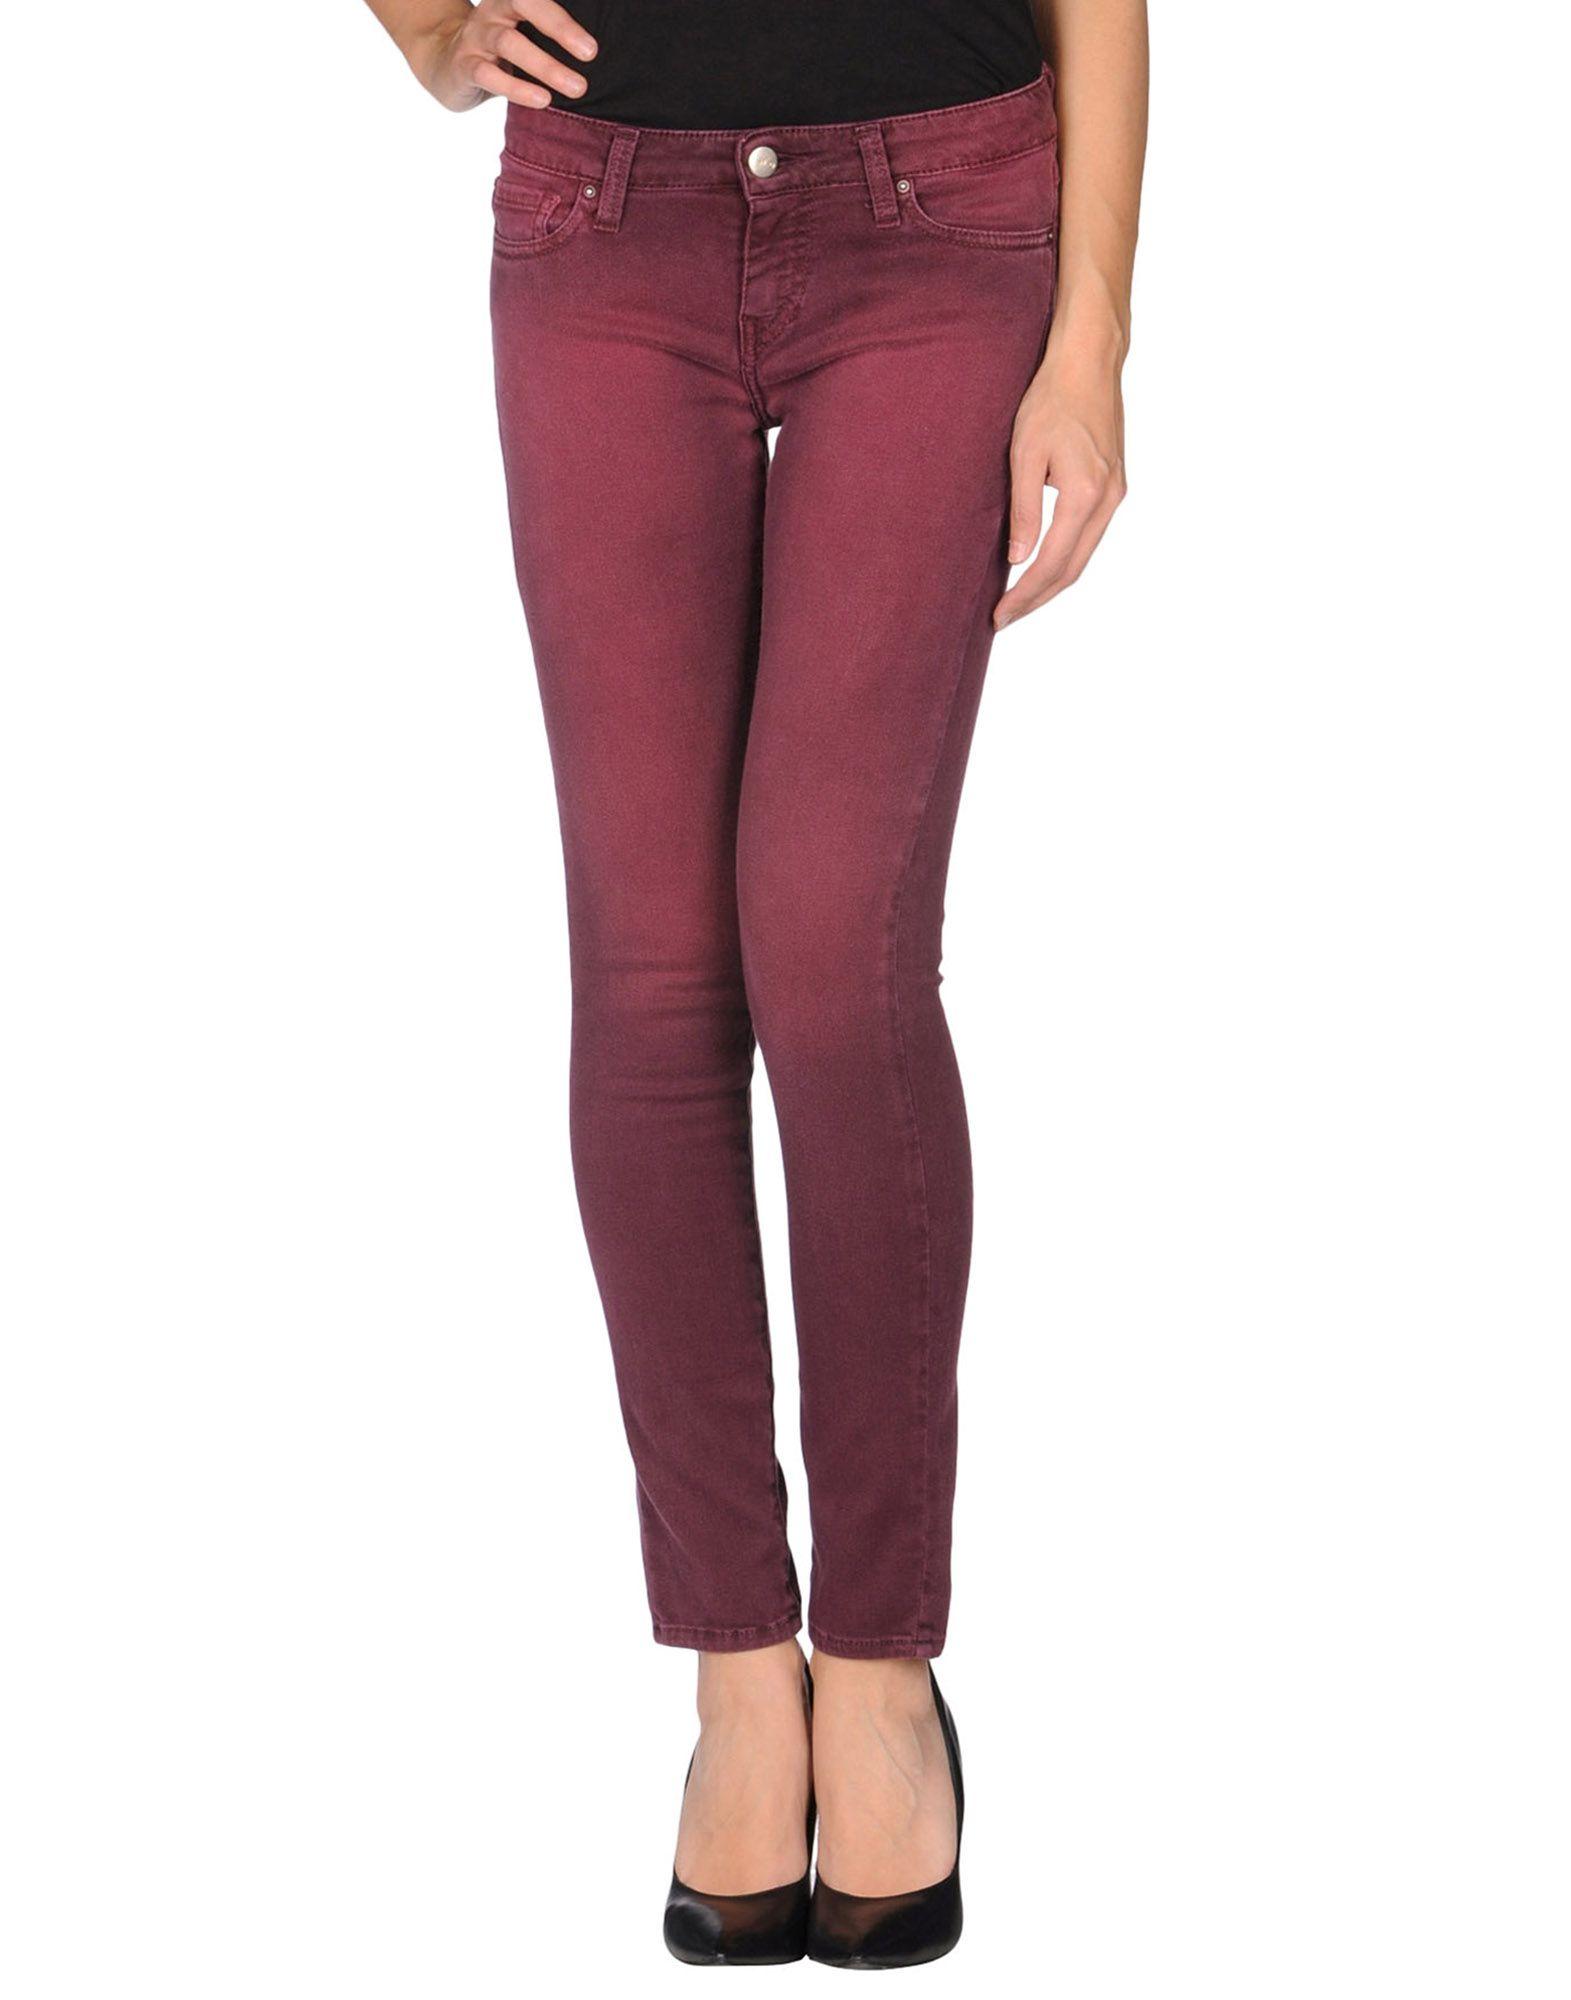 Perfect  Posts Outfit Post Burgundymaroon Cardigan Cream Shirt Black Pants